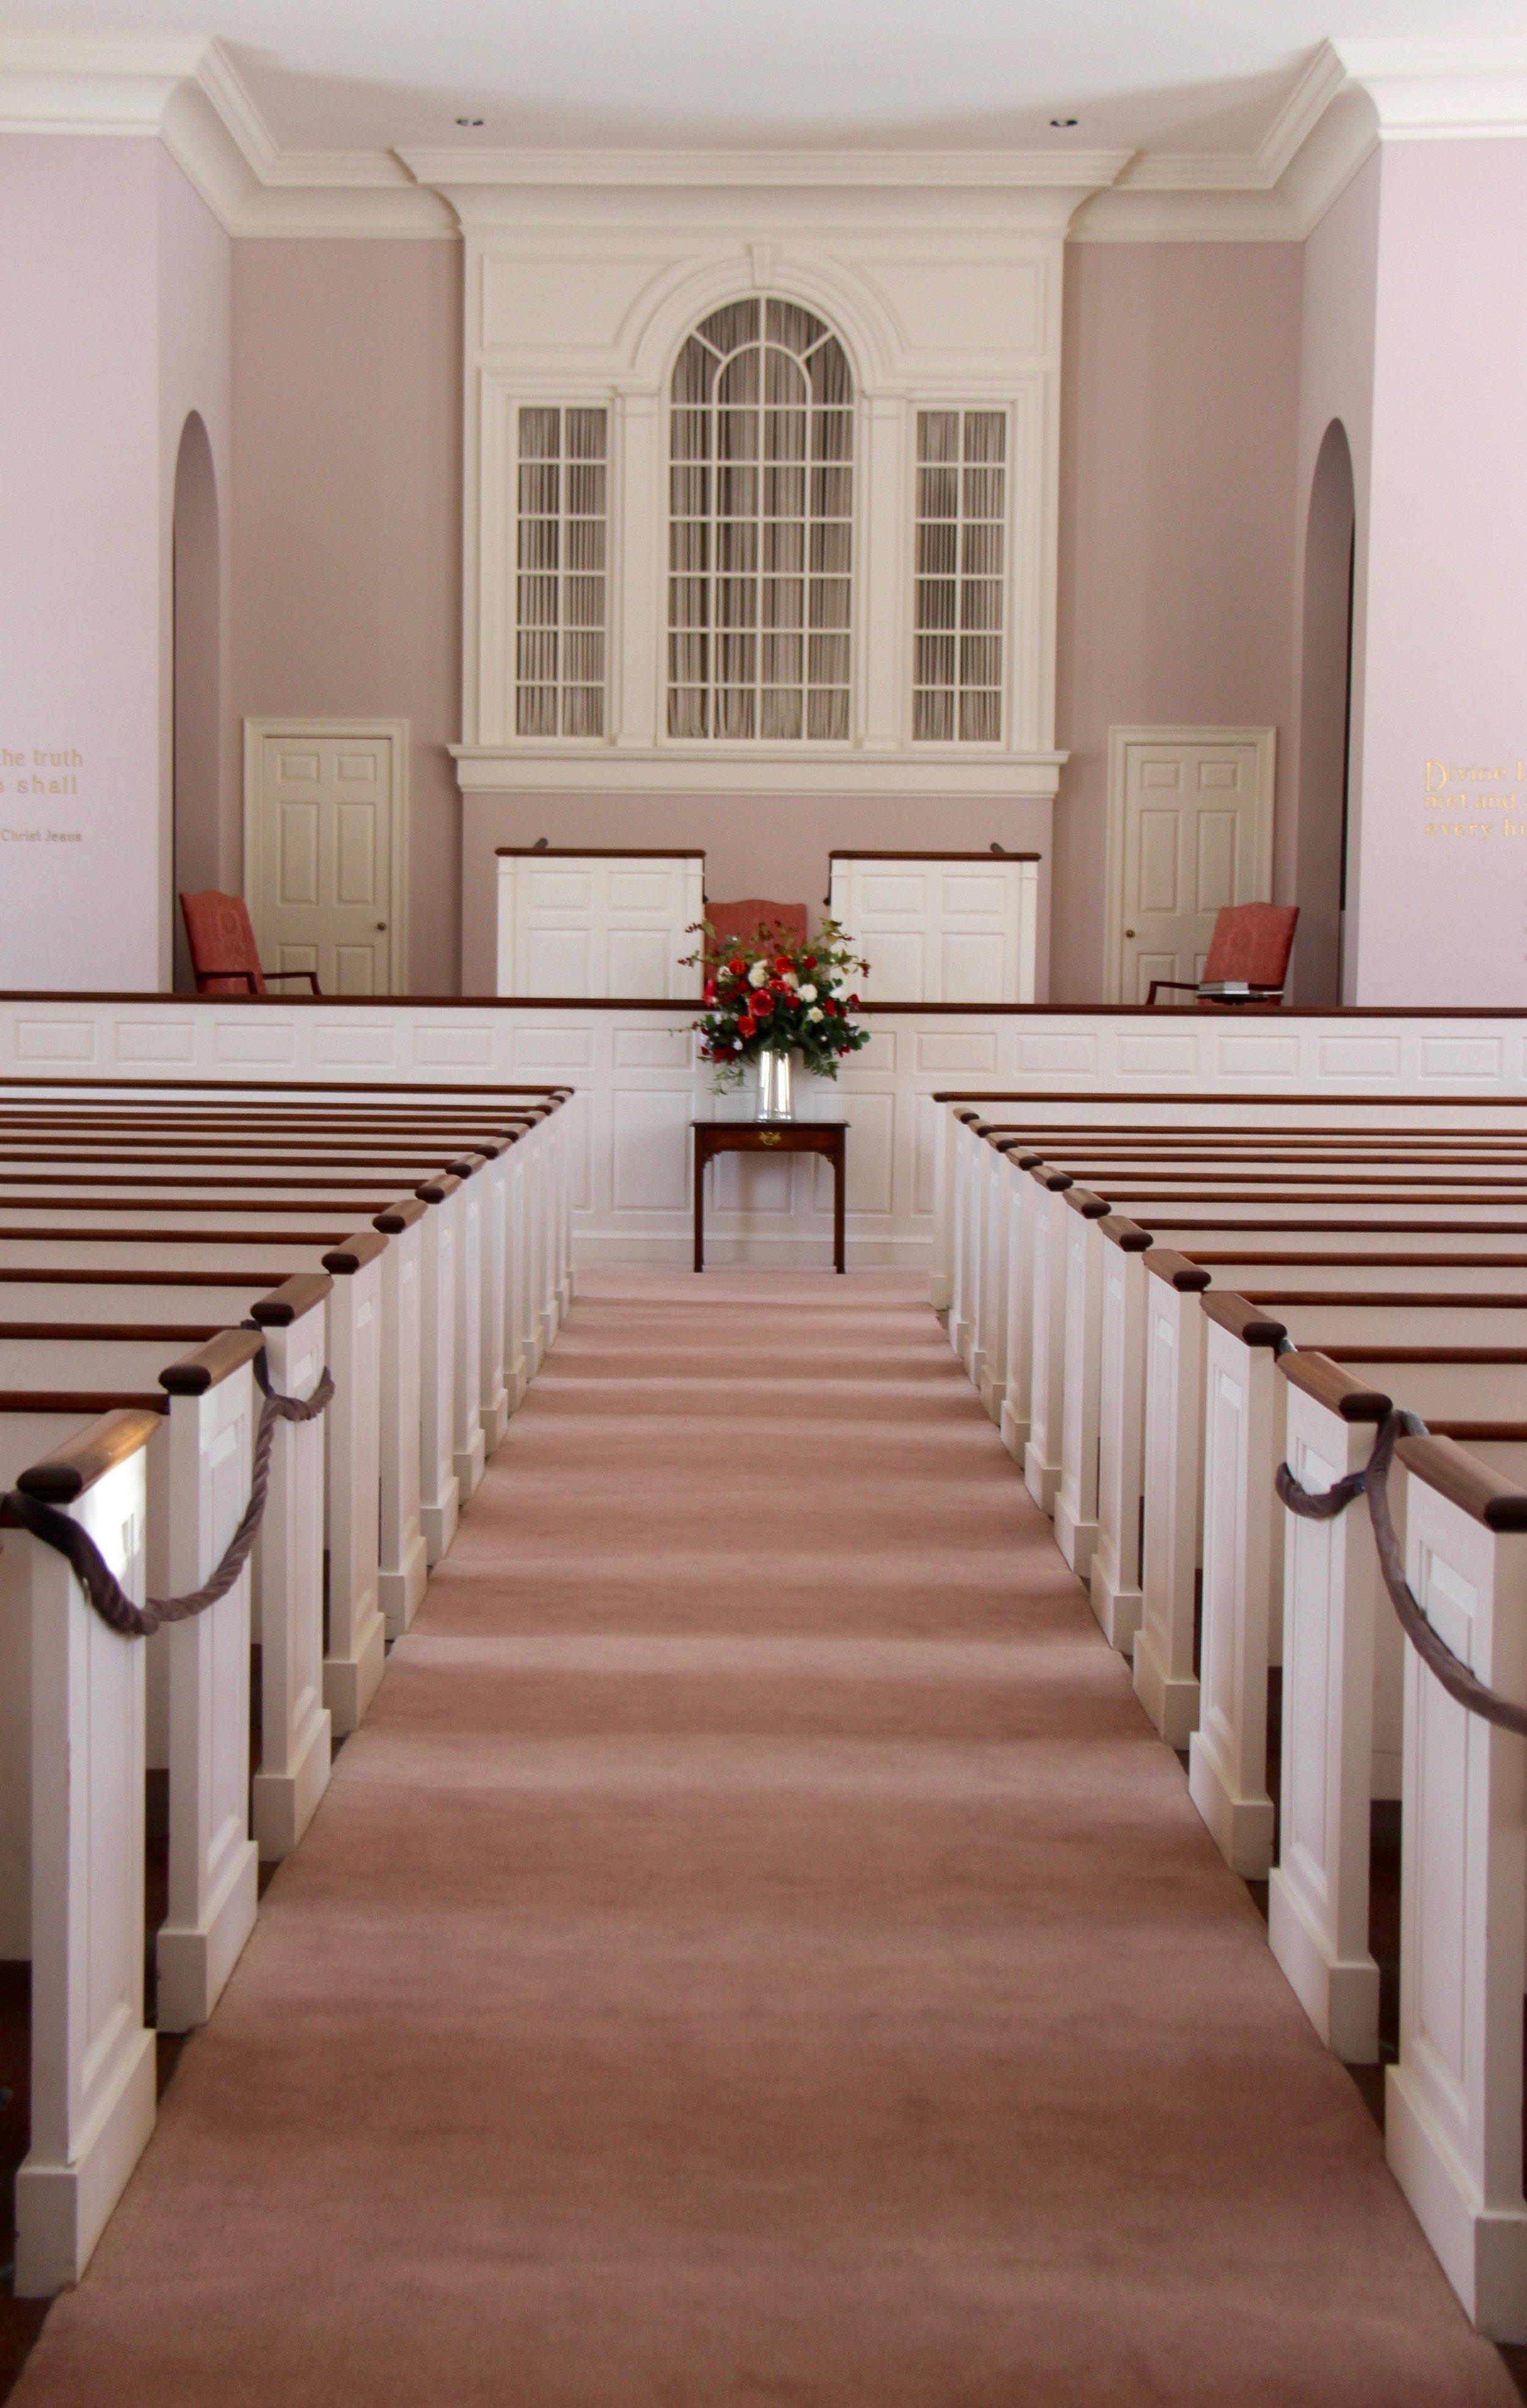 Christian Science Church, Winchester Massachusetts